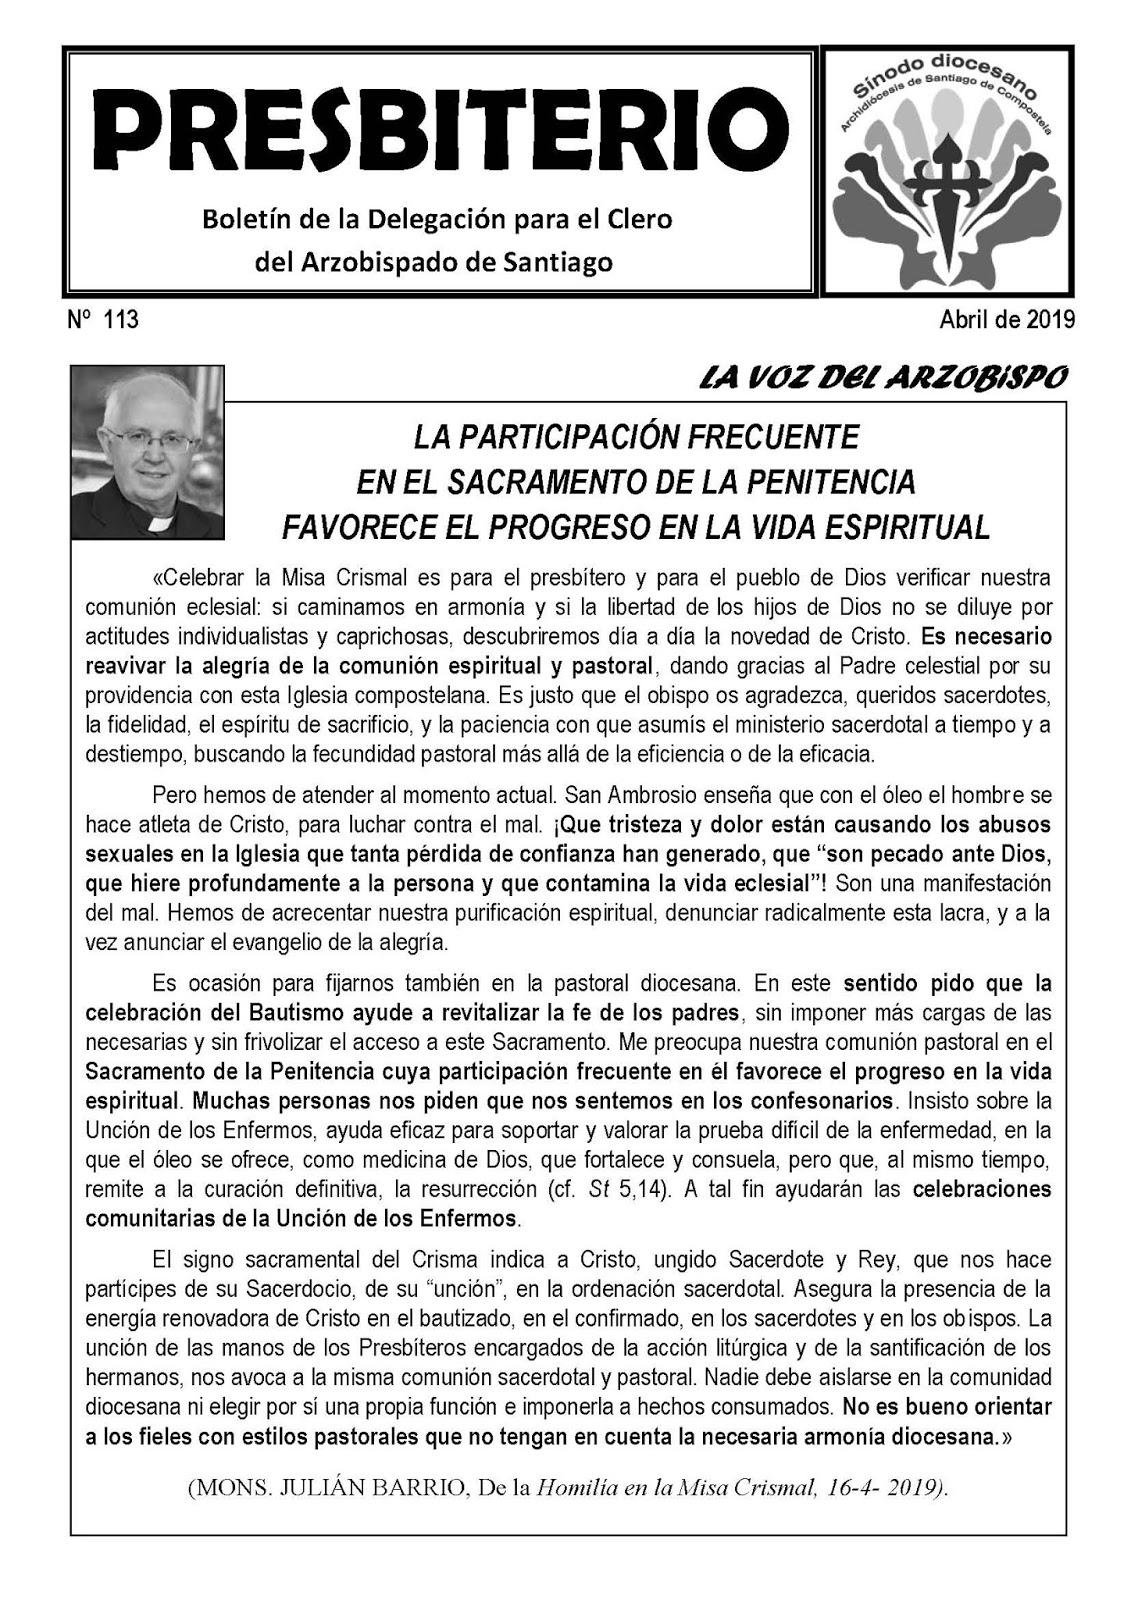 https://www.dropbox.com/s/jz92h4ftnoujyes/Presbiterio_113.pdf?dl=0